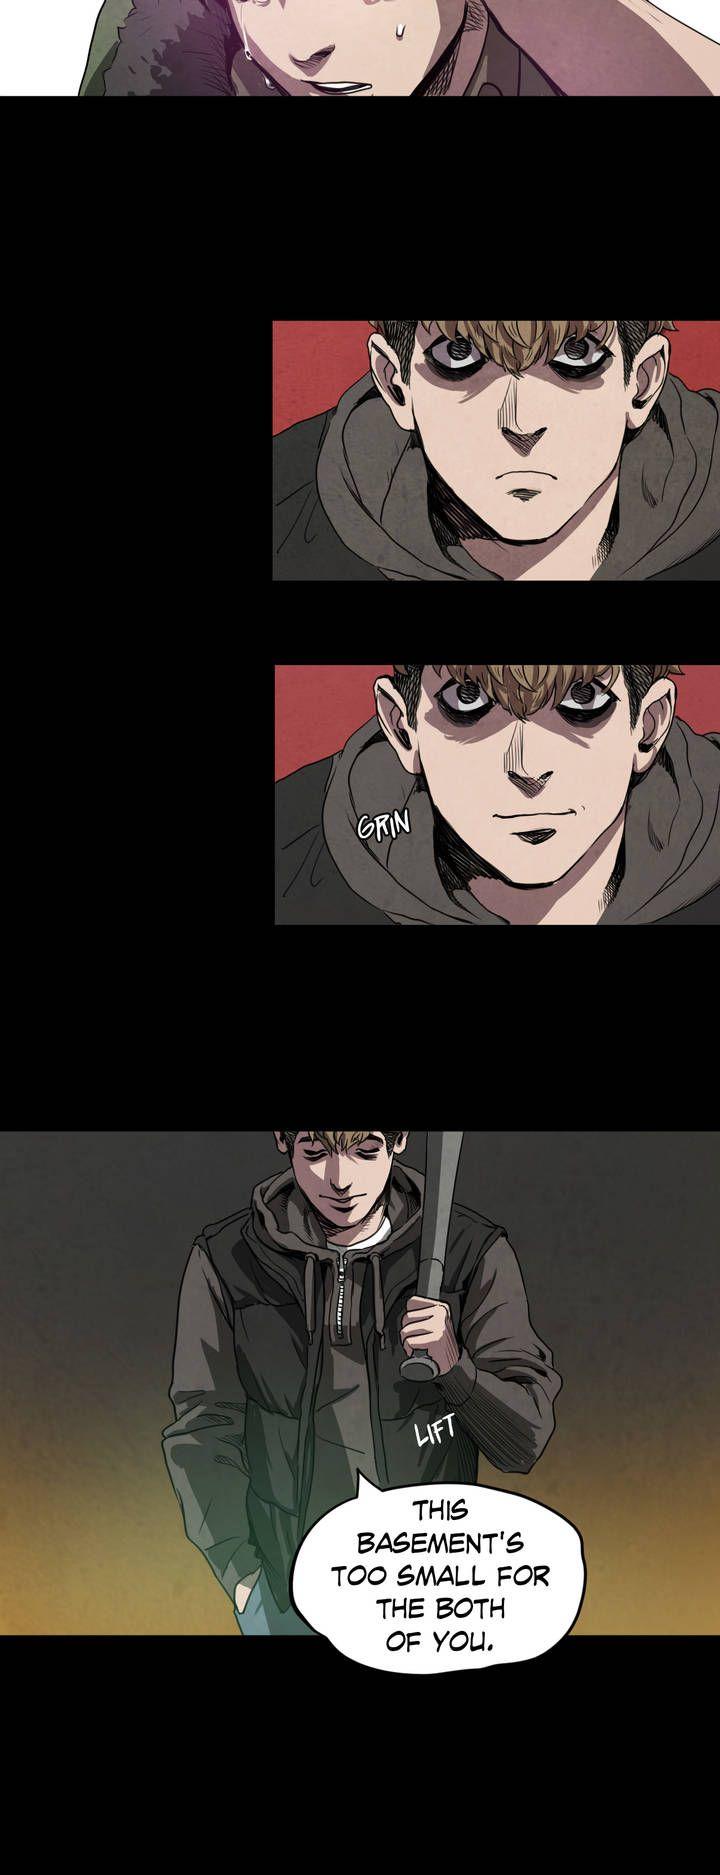 Killing stalking manga에 있뚔 핀